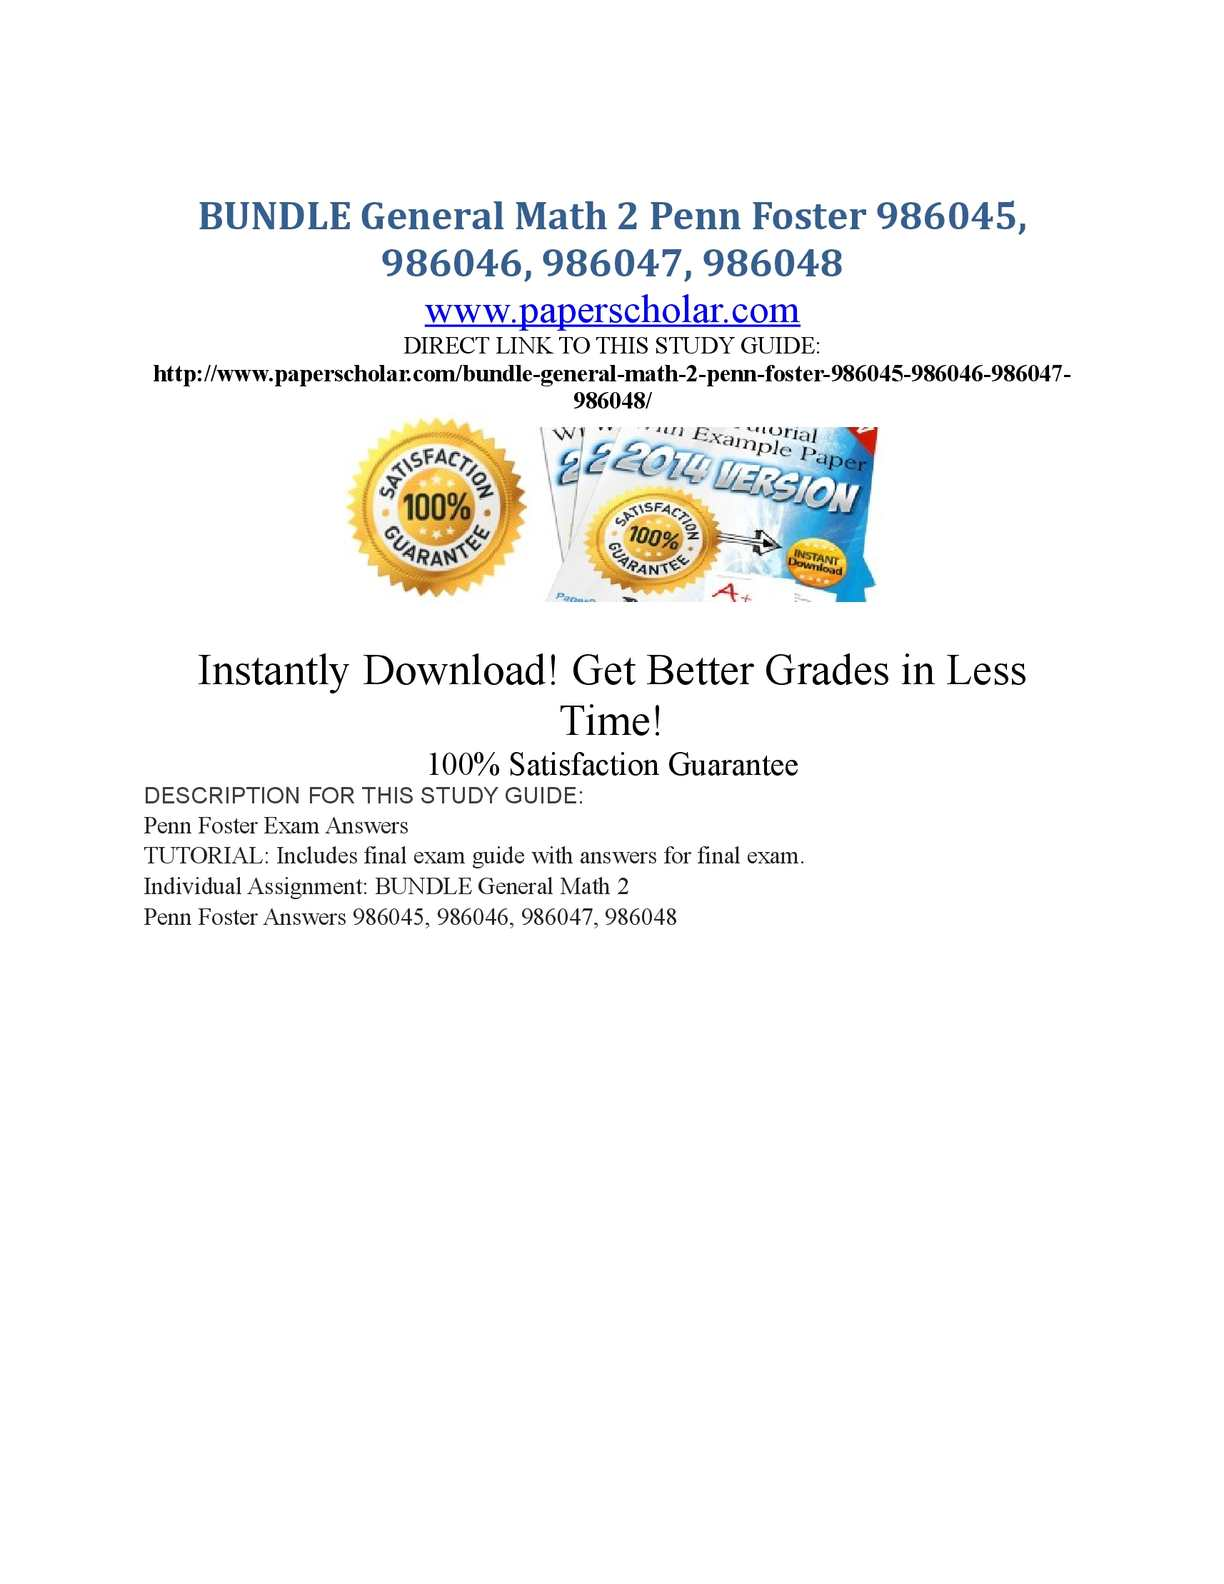 maths p1 study guide